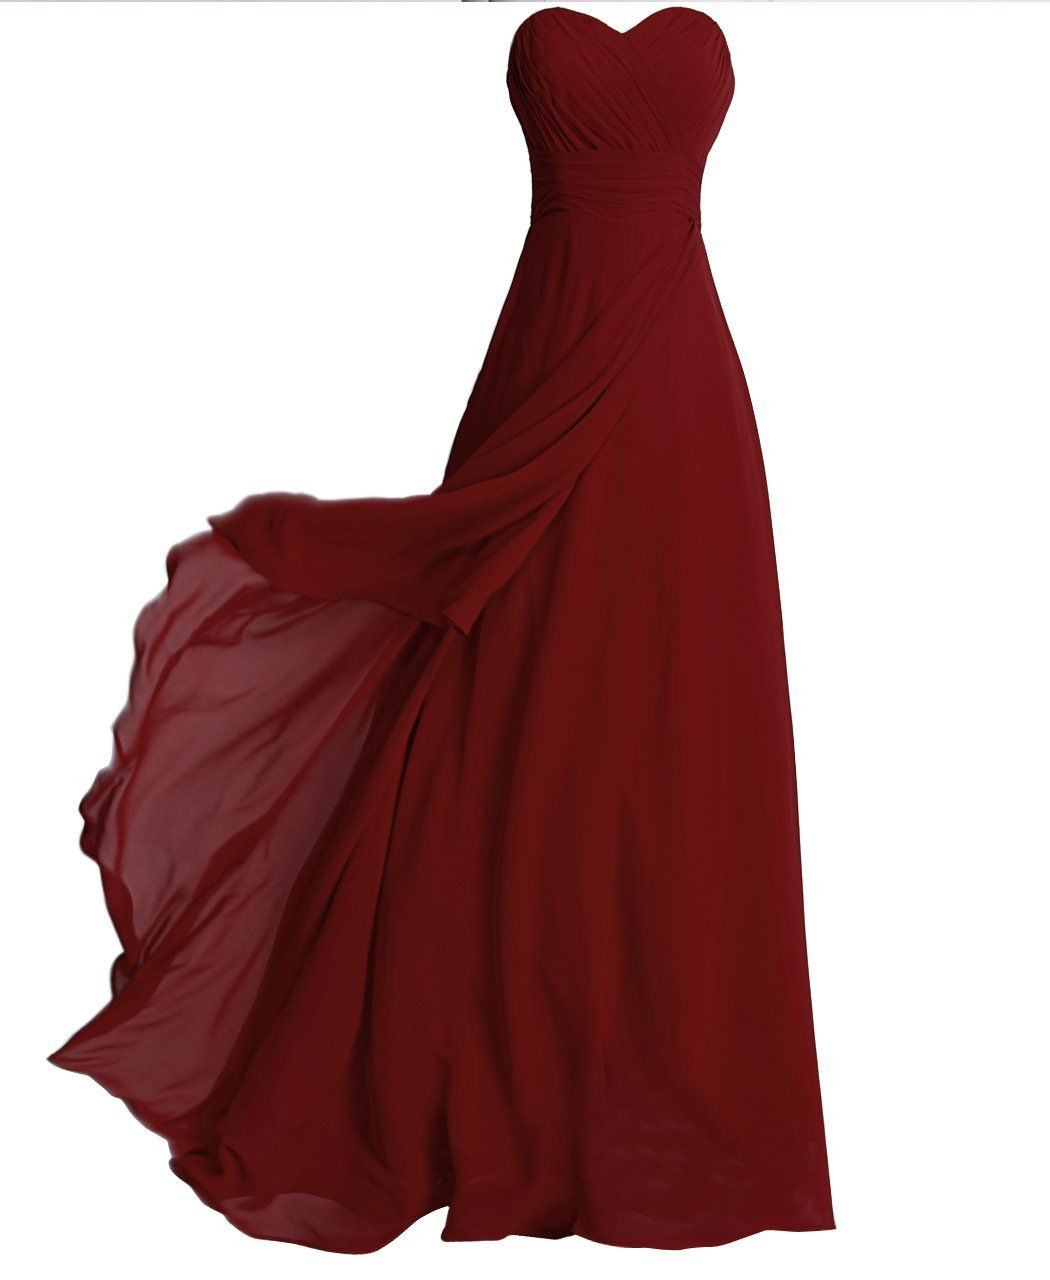 10 Cool Abendkleid Dunkelrot Lang Boutique20 Luxurius Abendkleid Dunkelrot Lang Bester Preis